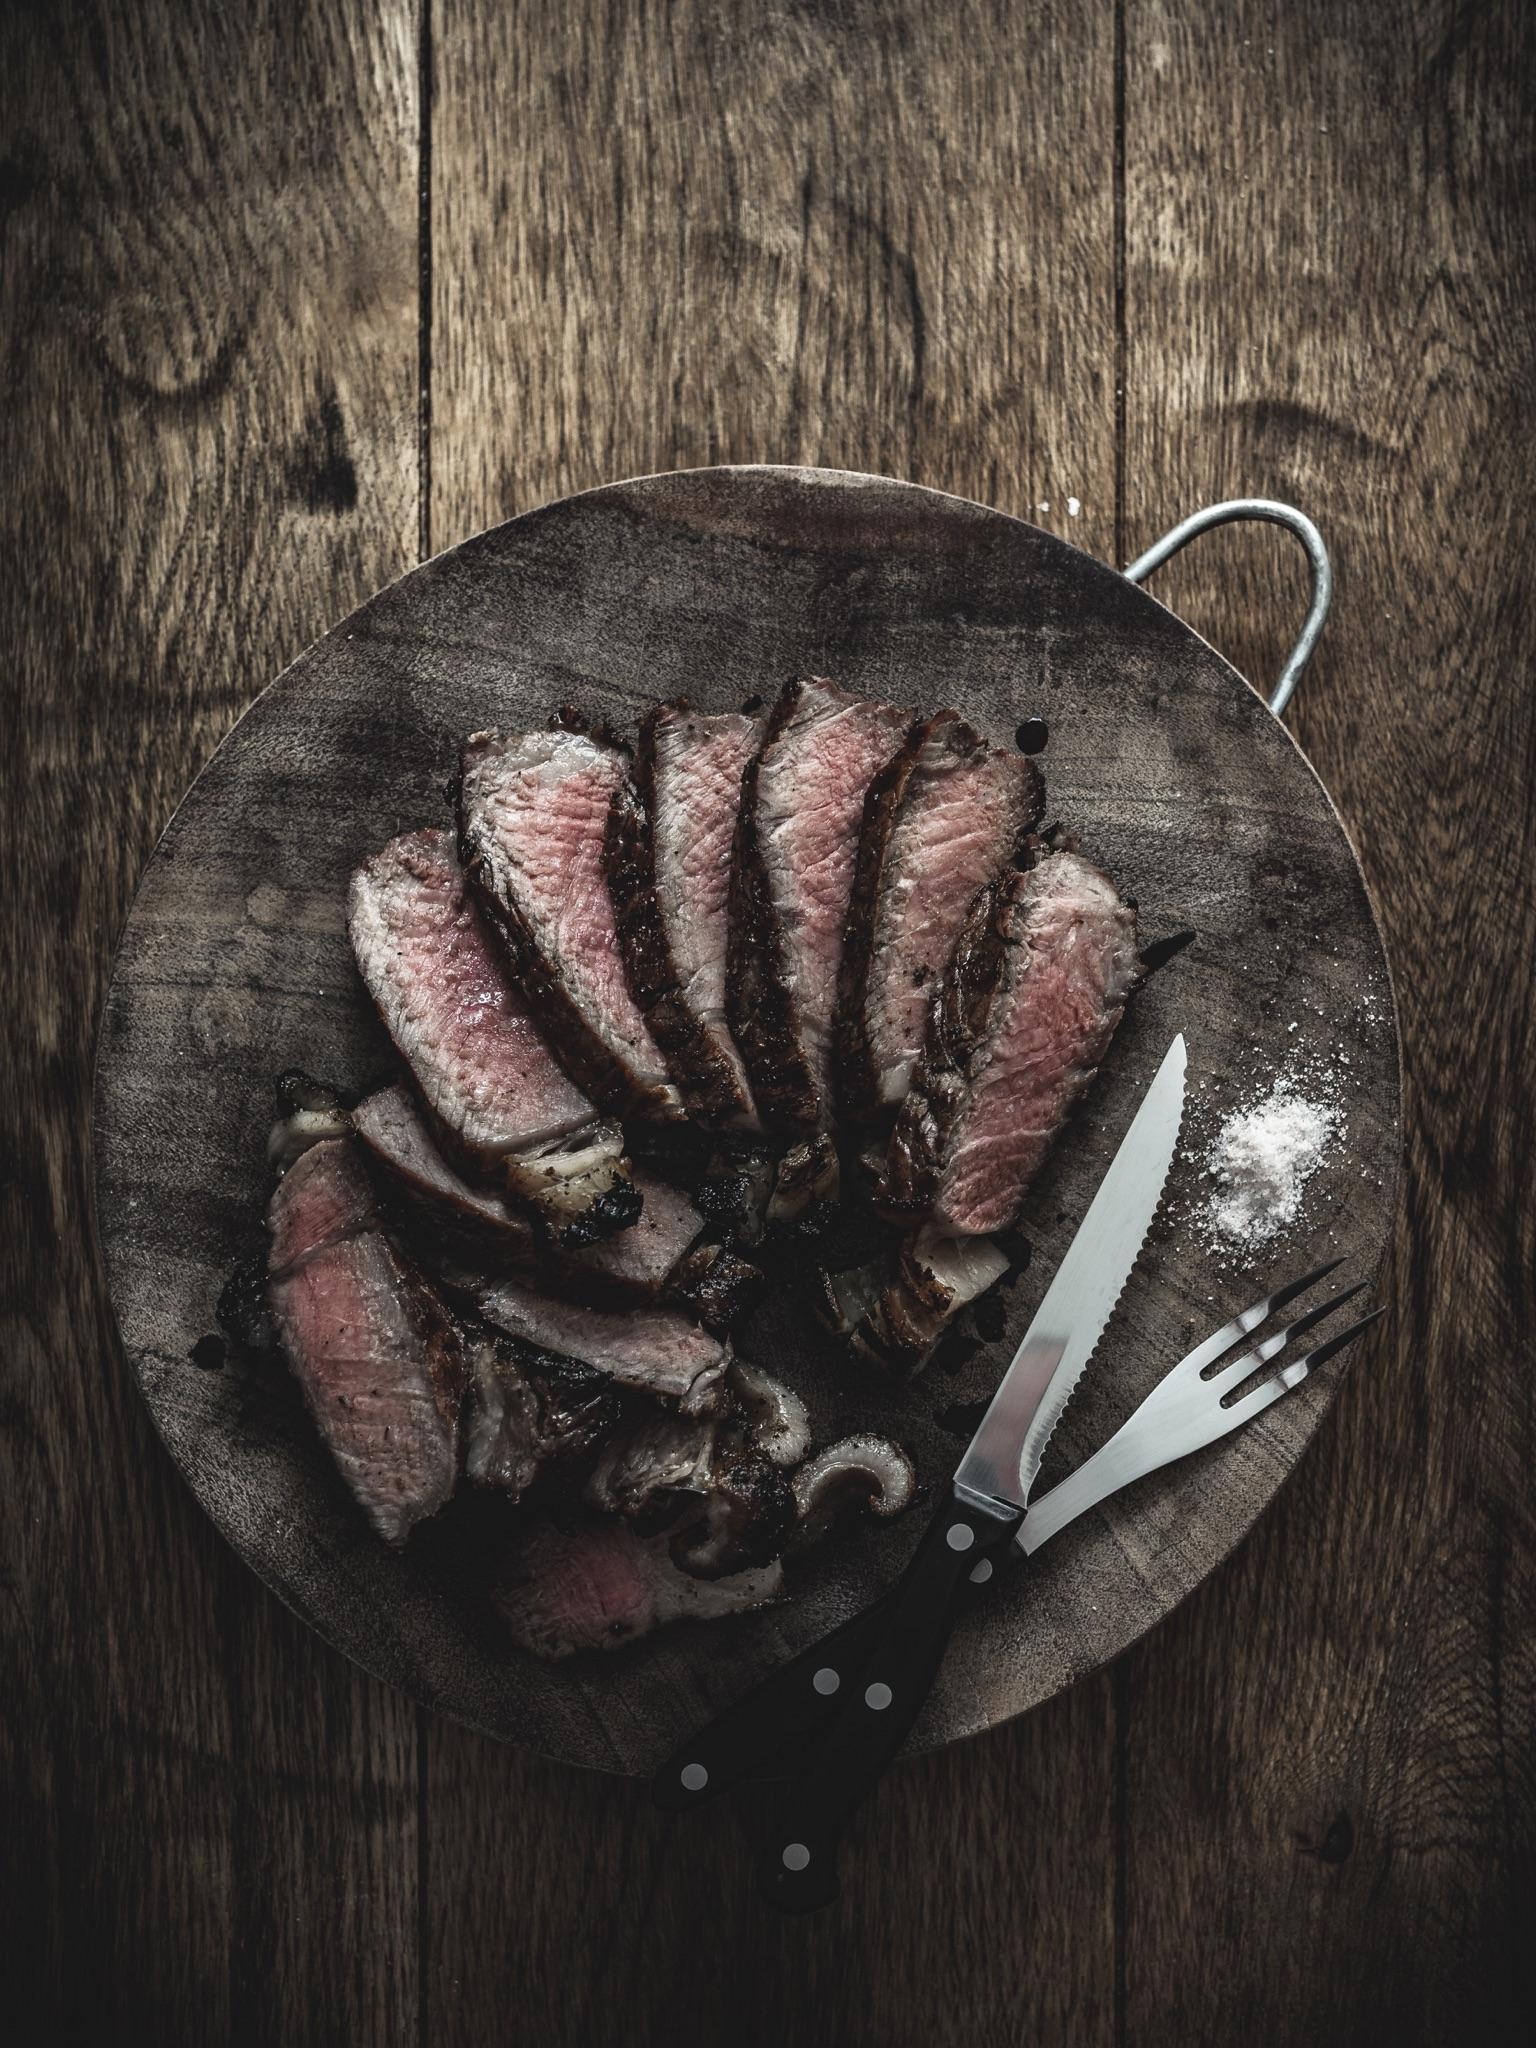 Carnivore diet sirloin steak from the butcher medium rare